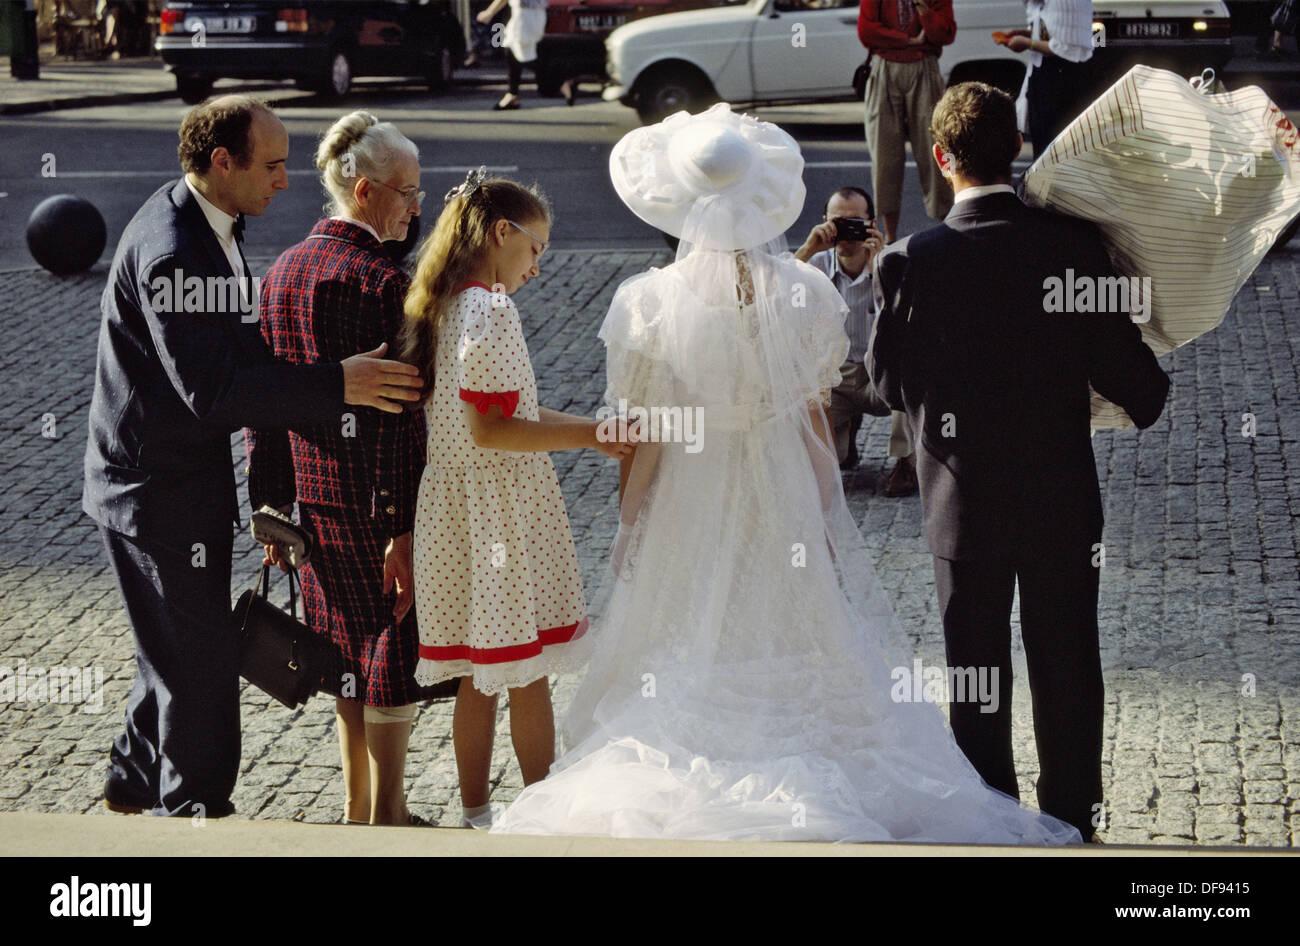 St. Denis, mariage, photography, France - Stock Image